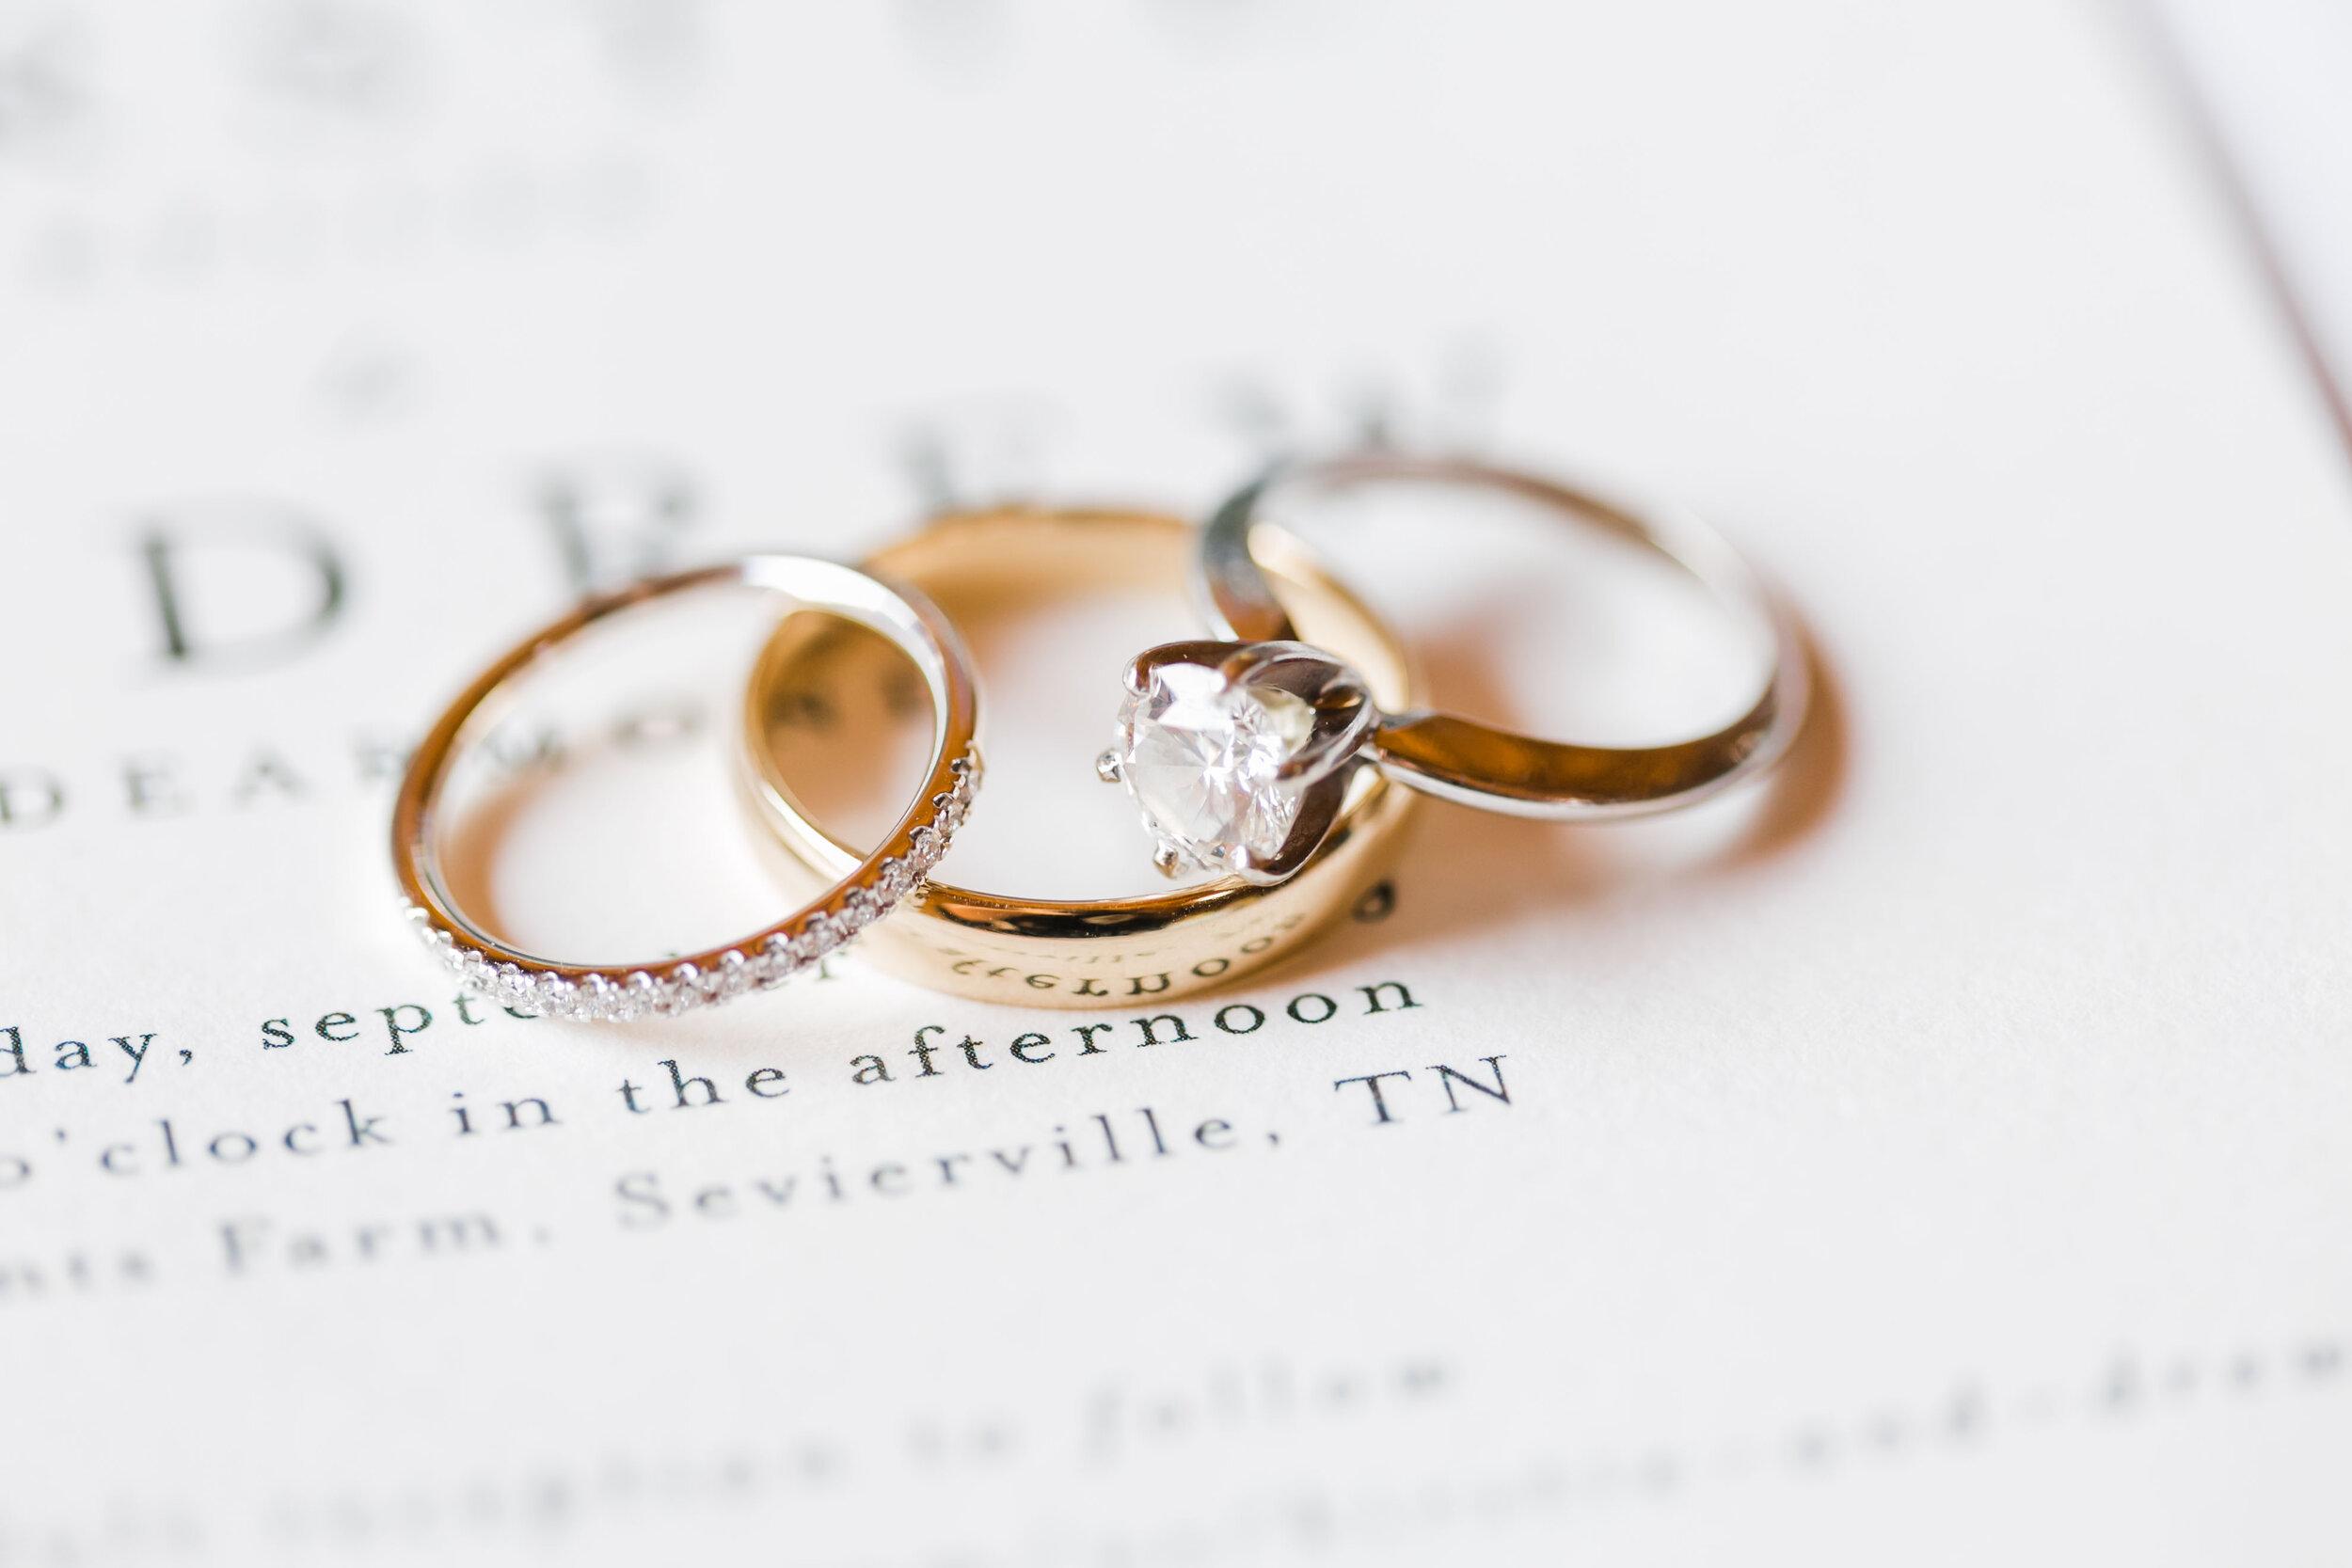 mixed metal wedding rings on invitation